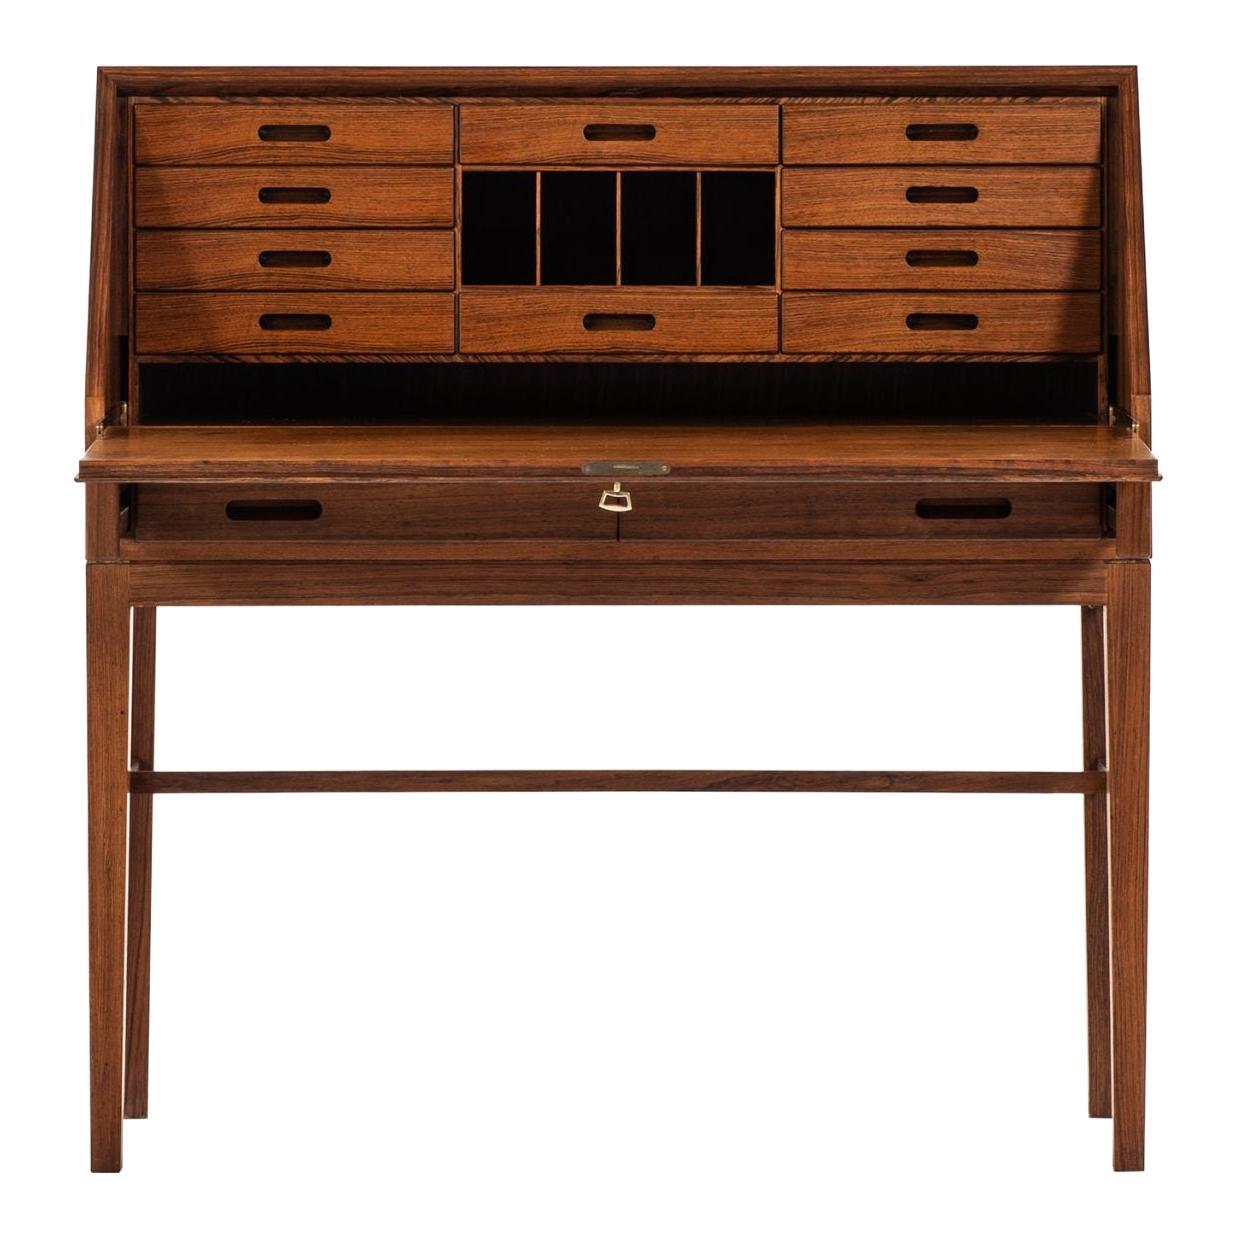 Kai Winding Bureau / Secretaire Produced by Cabinetmaker P. Jeppesen in Denmark